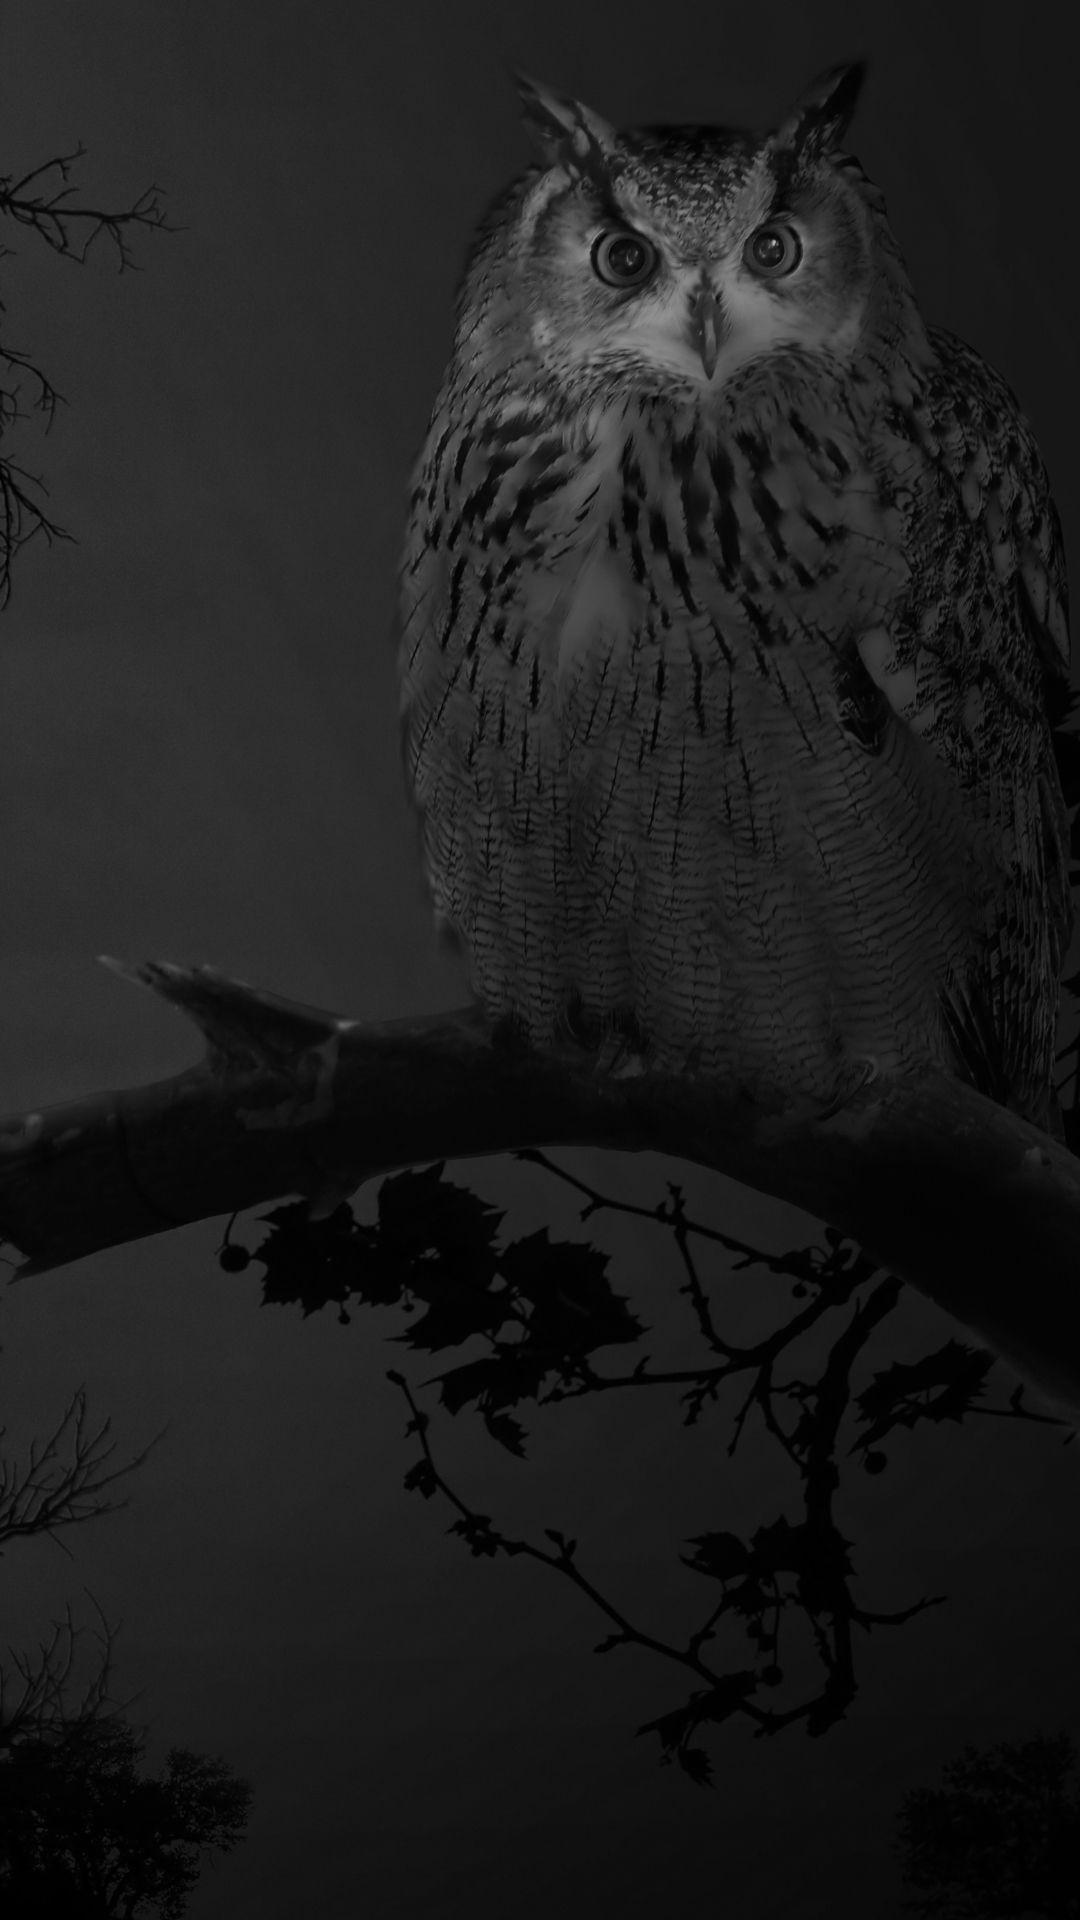 Photo of Owl Iphone Hintergrund – Owl Iphone Hintergrund #Owl #Iphone #Background – #back …